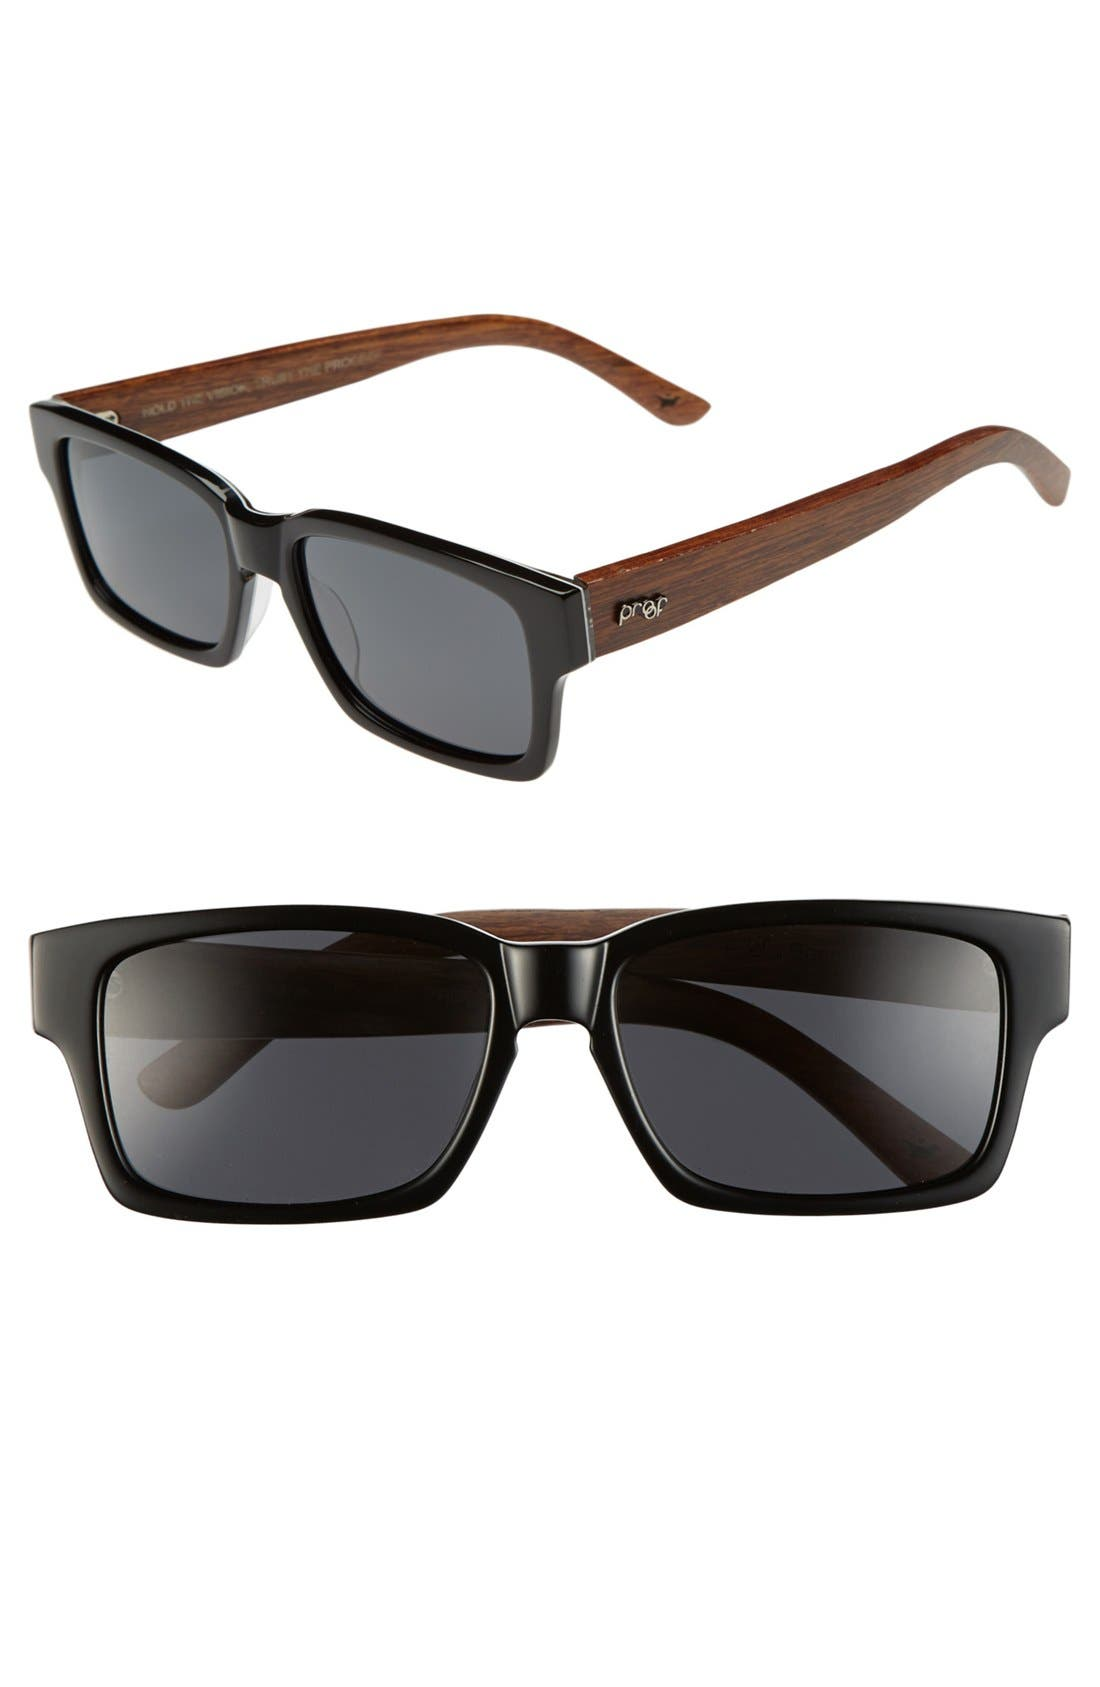 Alternate Image 1 Selected - Proof Eyewear 'Bannock' 52mm Wood Temple Polarized Sunglasses